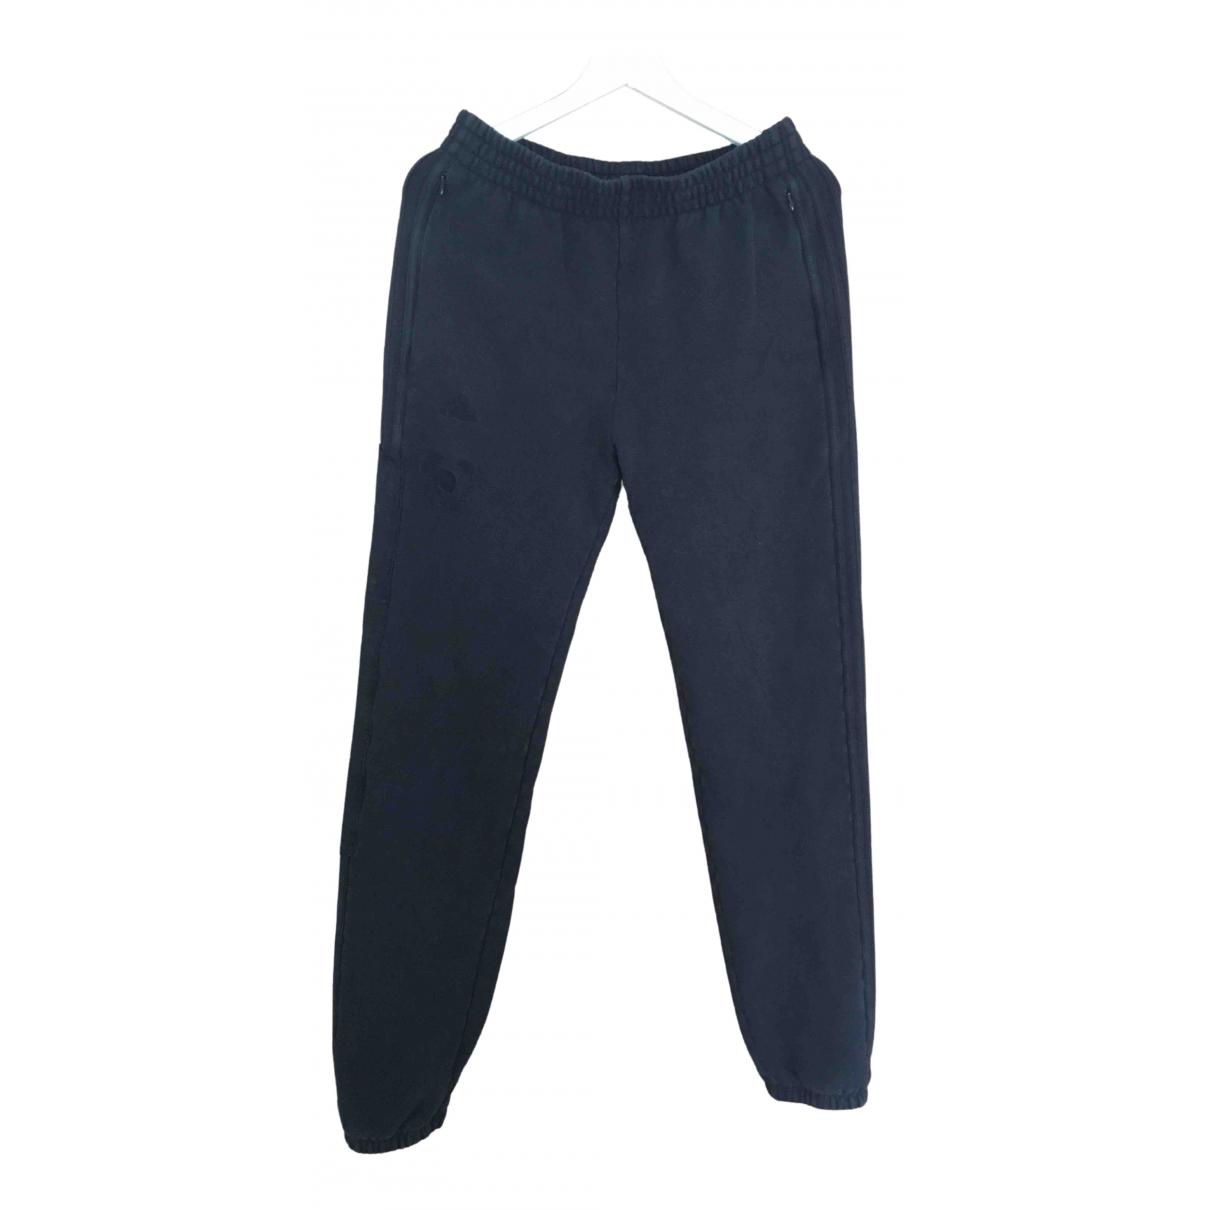 Yeezy X Adidas \N Black Cotton Trousers for Women M International